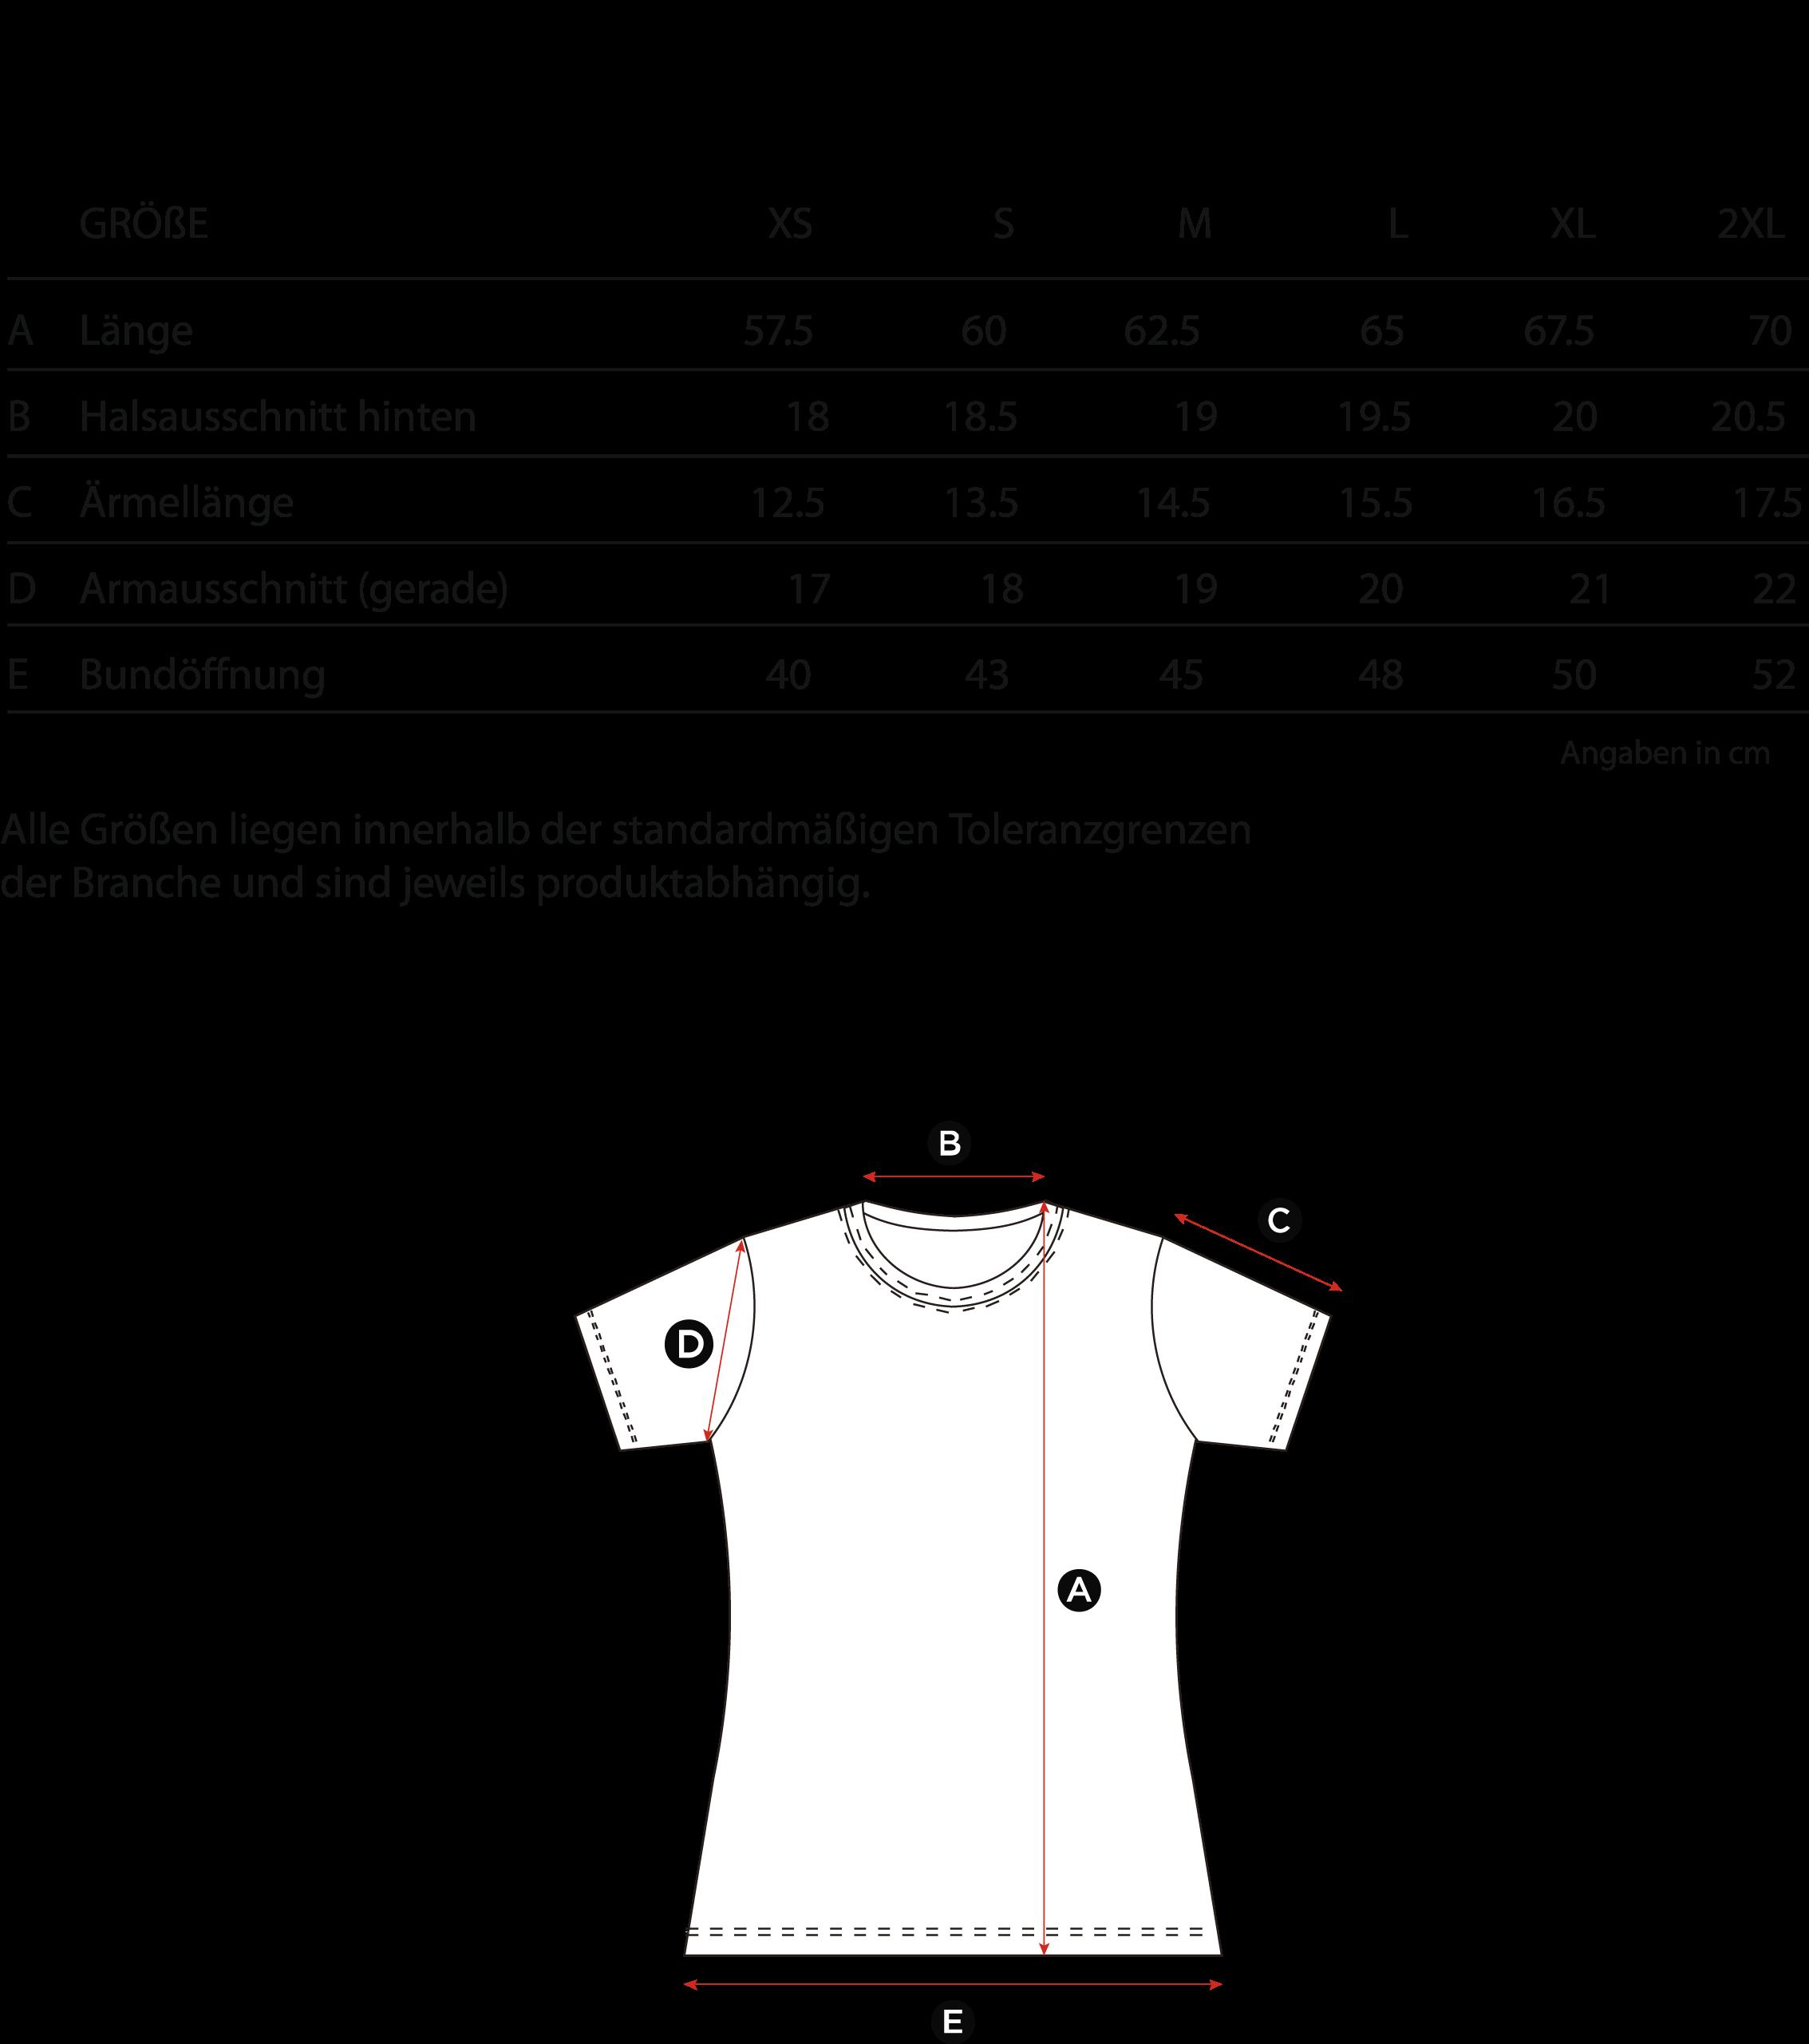 Gro-ssentabelle-Damen-T-ShirtCuYk4C8sSNS1s